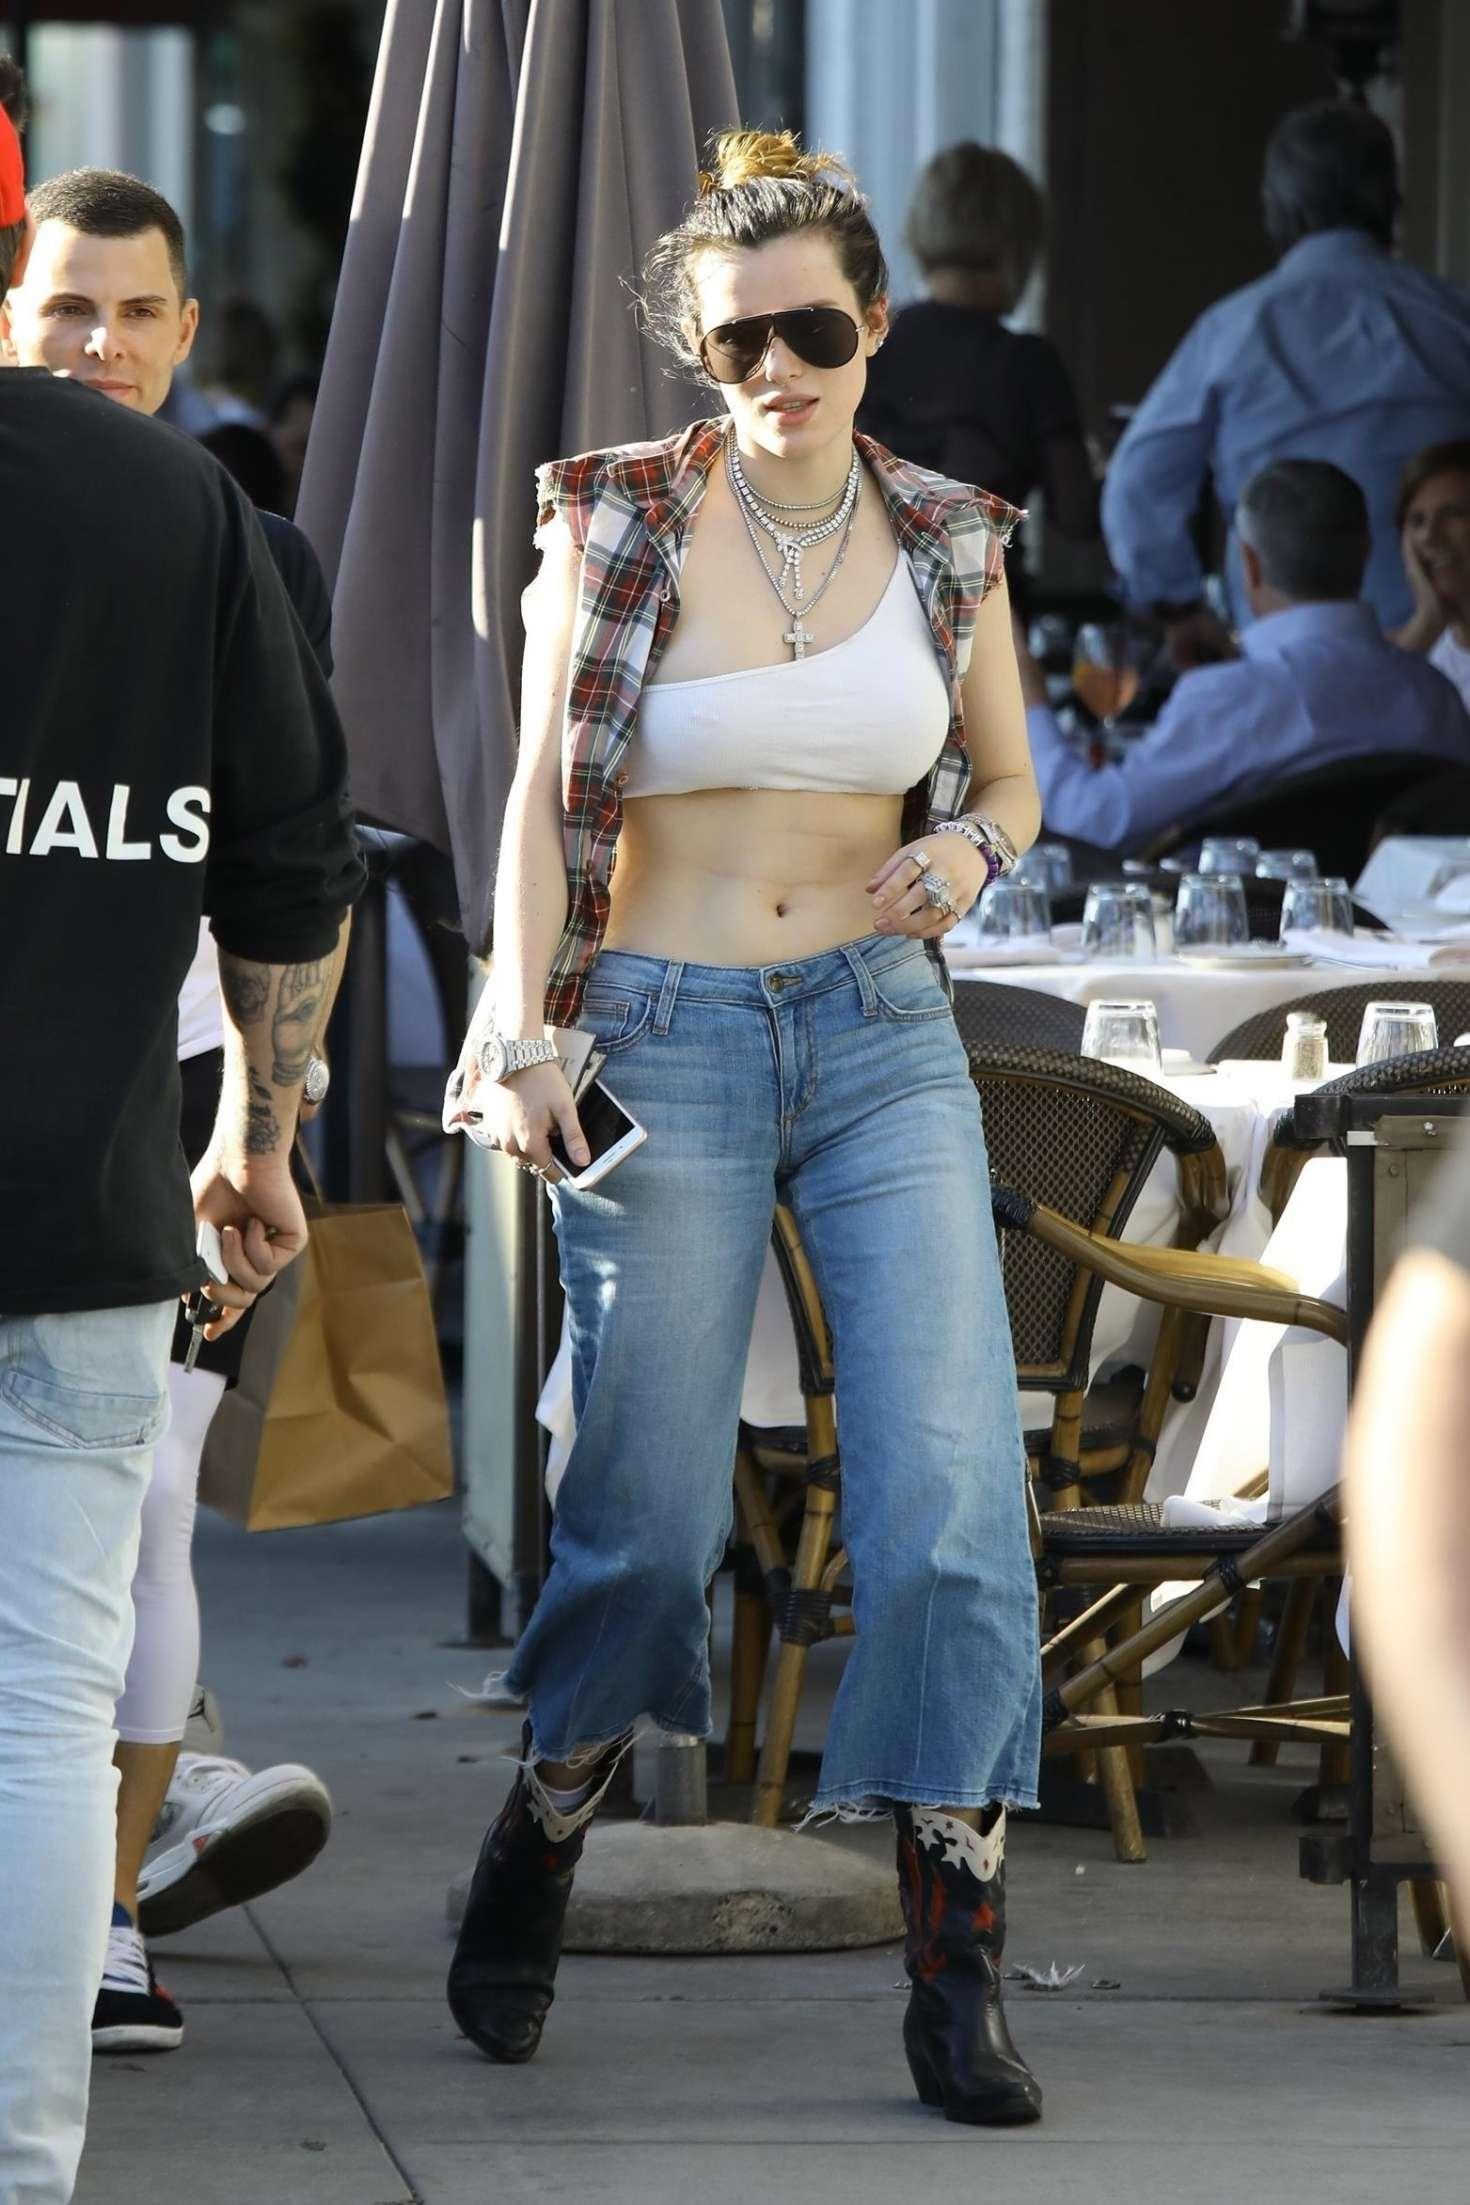 Bella Thorne 2019 : Bella Thorne: Grabbing lunch with friends in LA -11